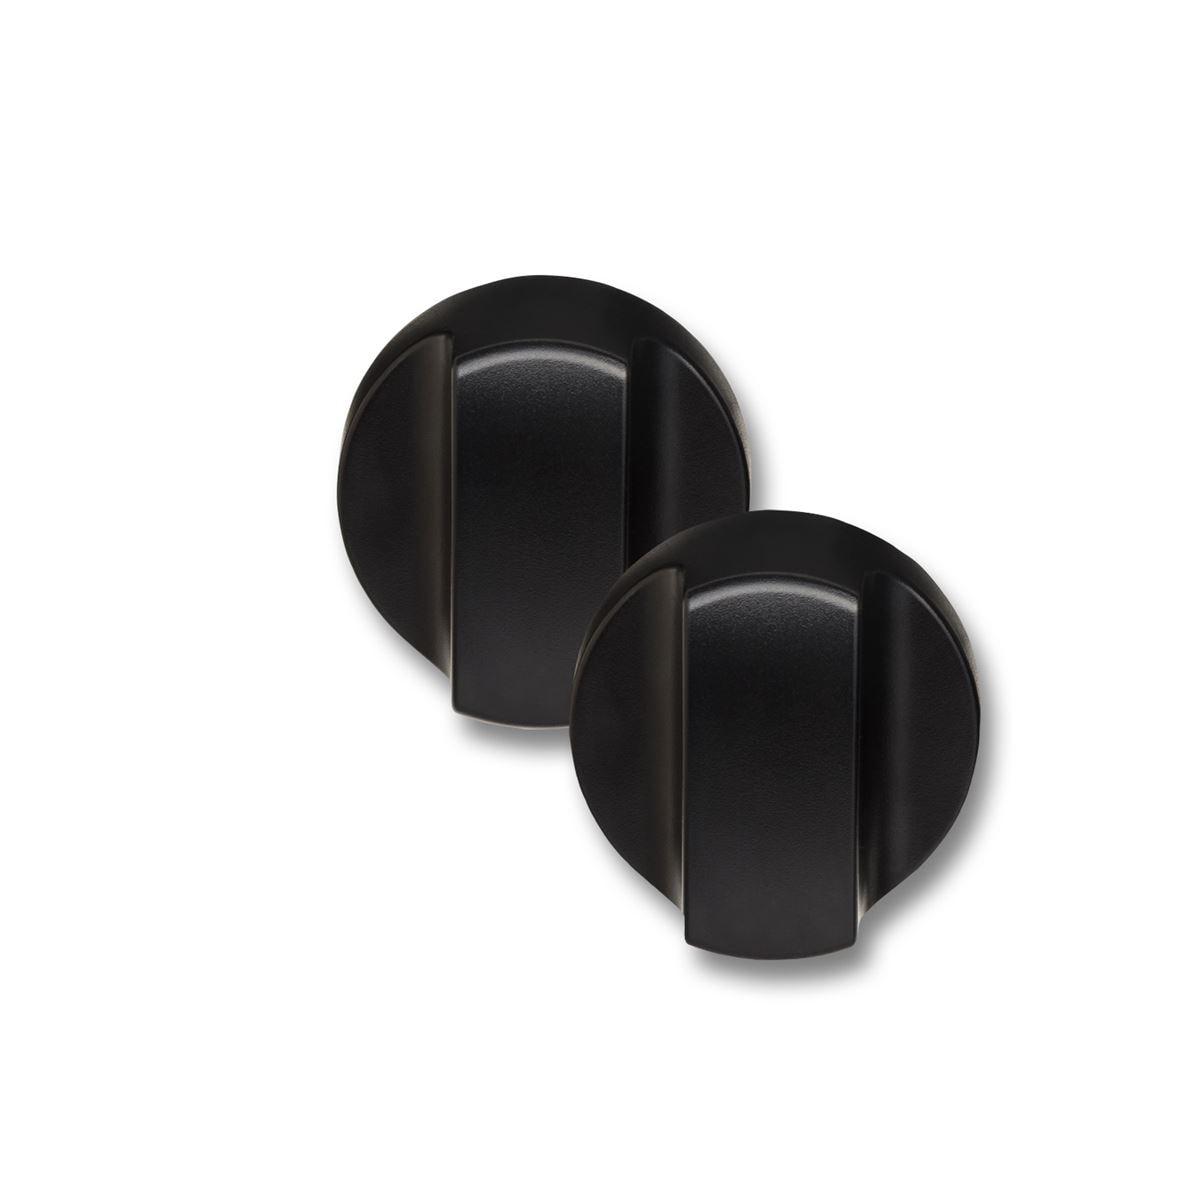 Countertop Oven Knobs Black